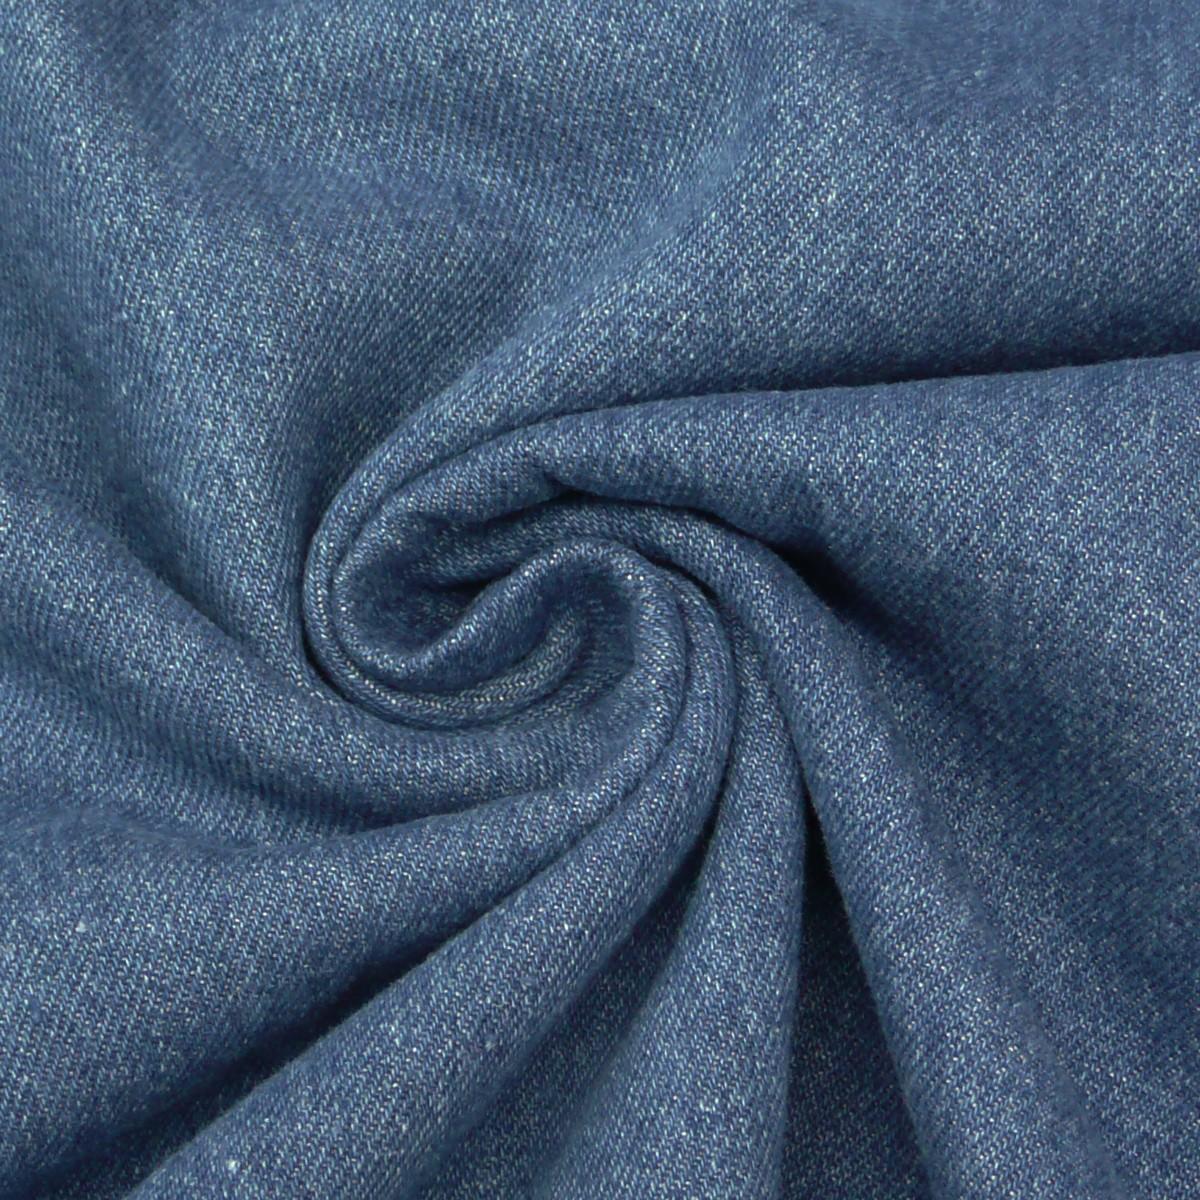 Jeansstoff Stoff Jeans 9,5OZ jeansblau denim